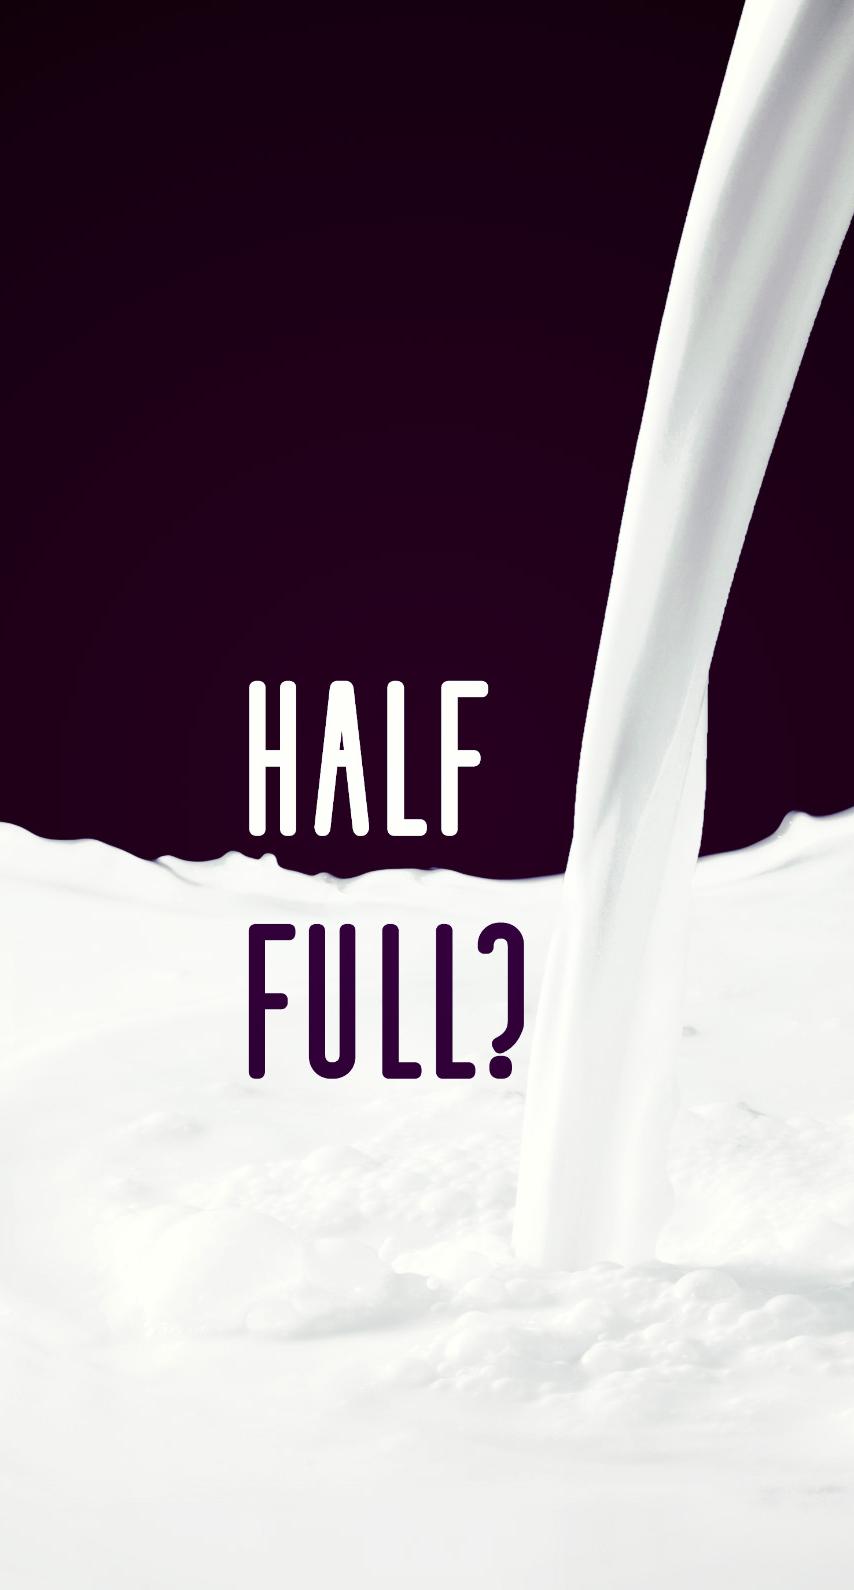 fluid, dairy